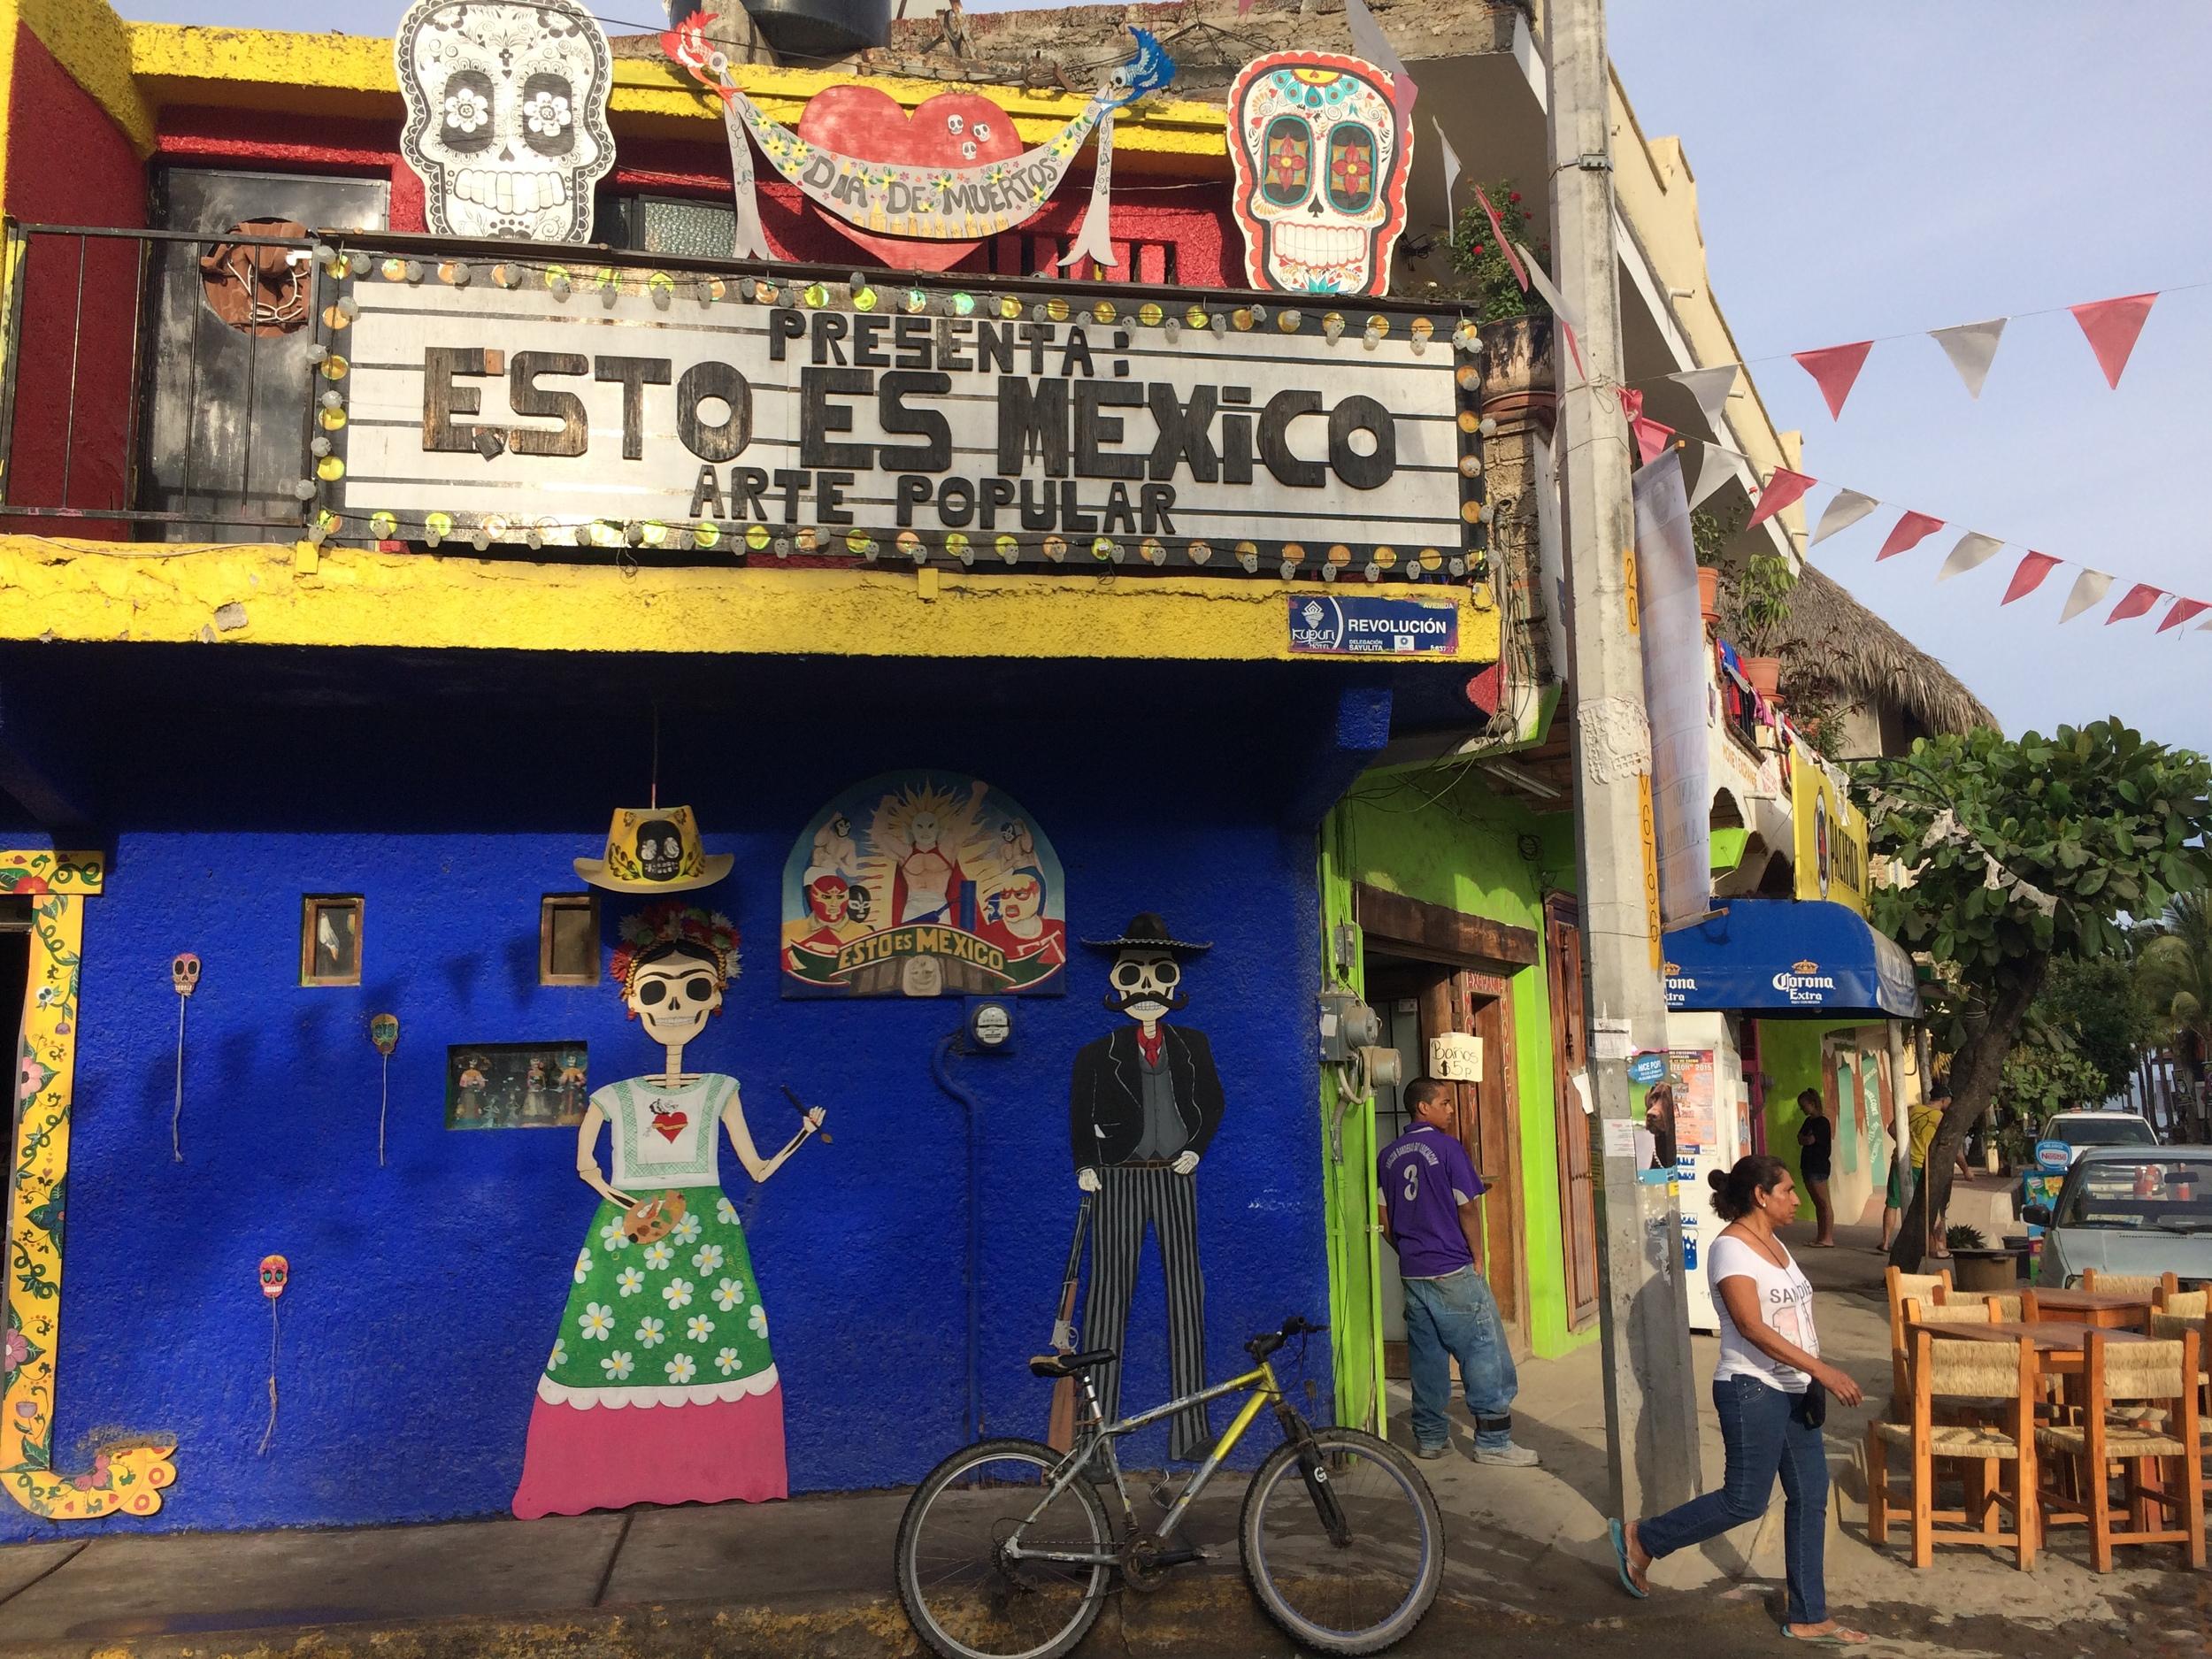 Sayulita sentrum. Mexicanere er glad i farger.